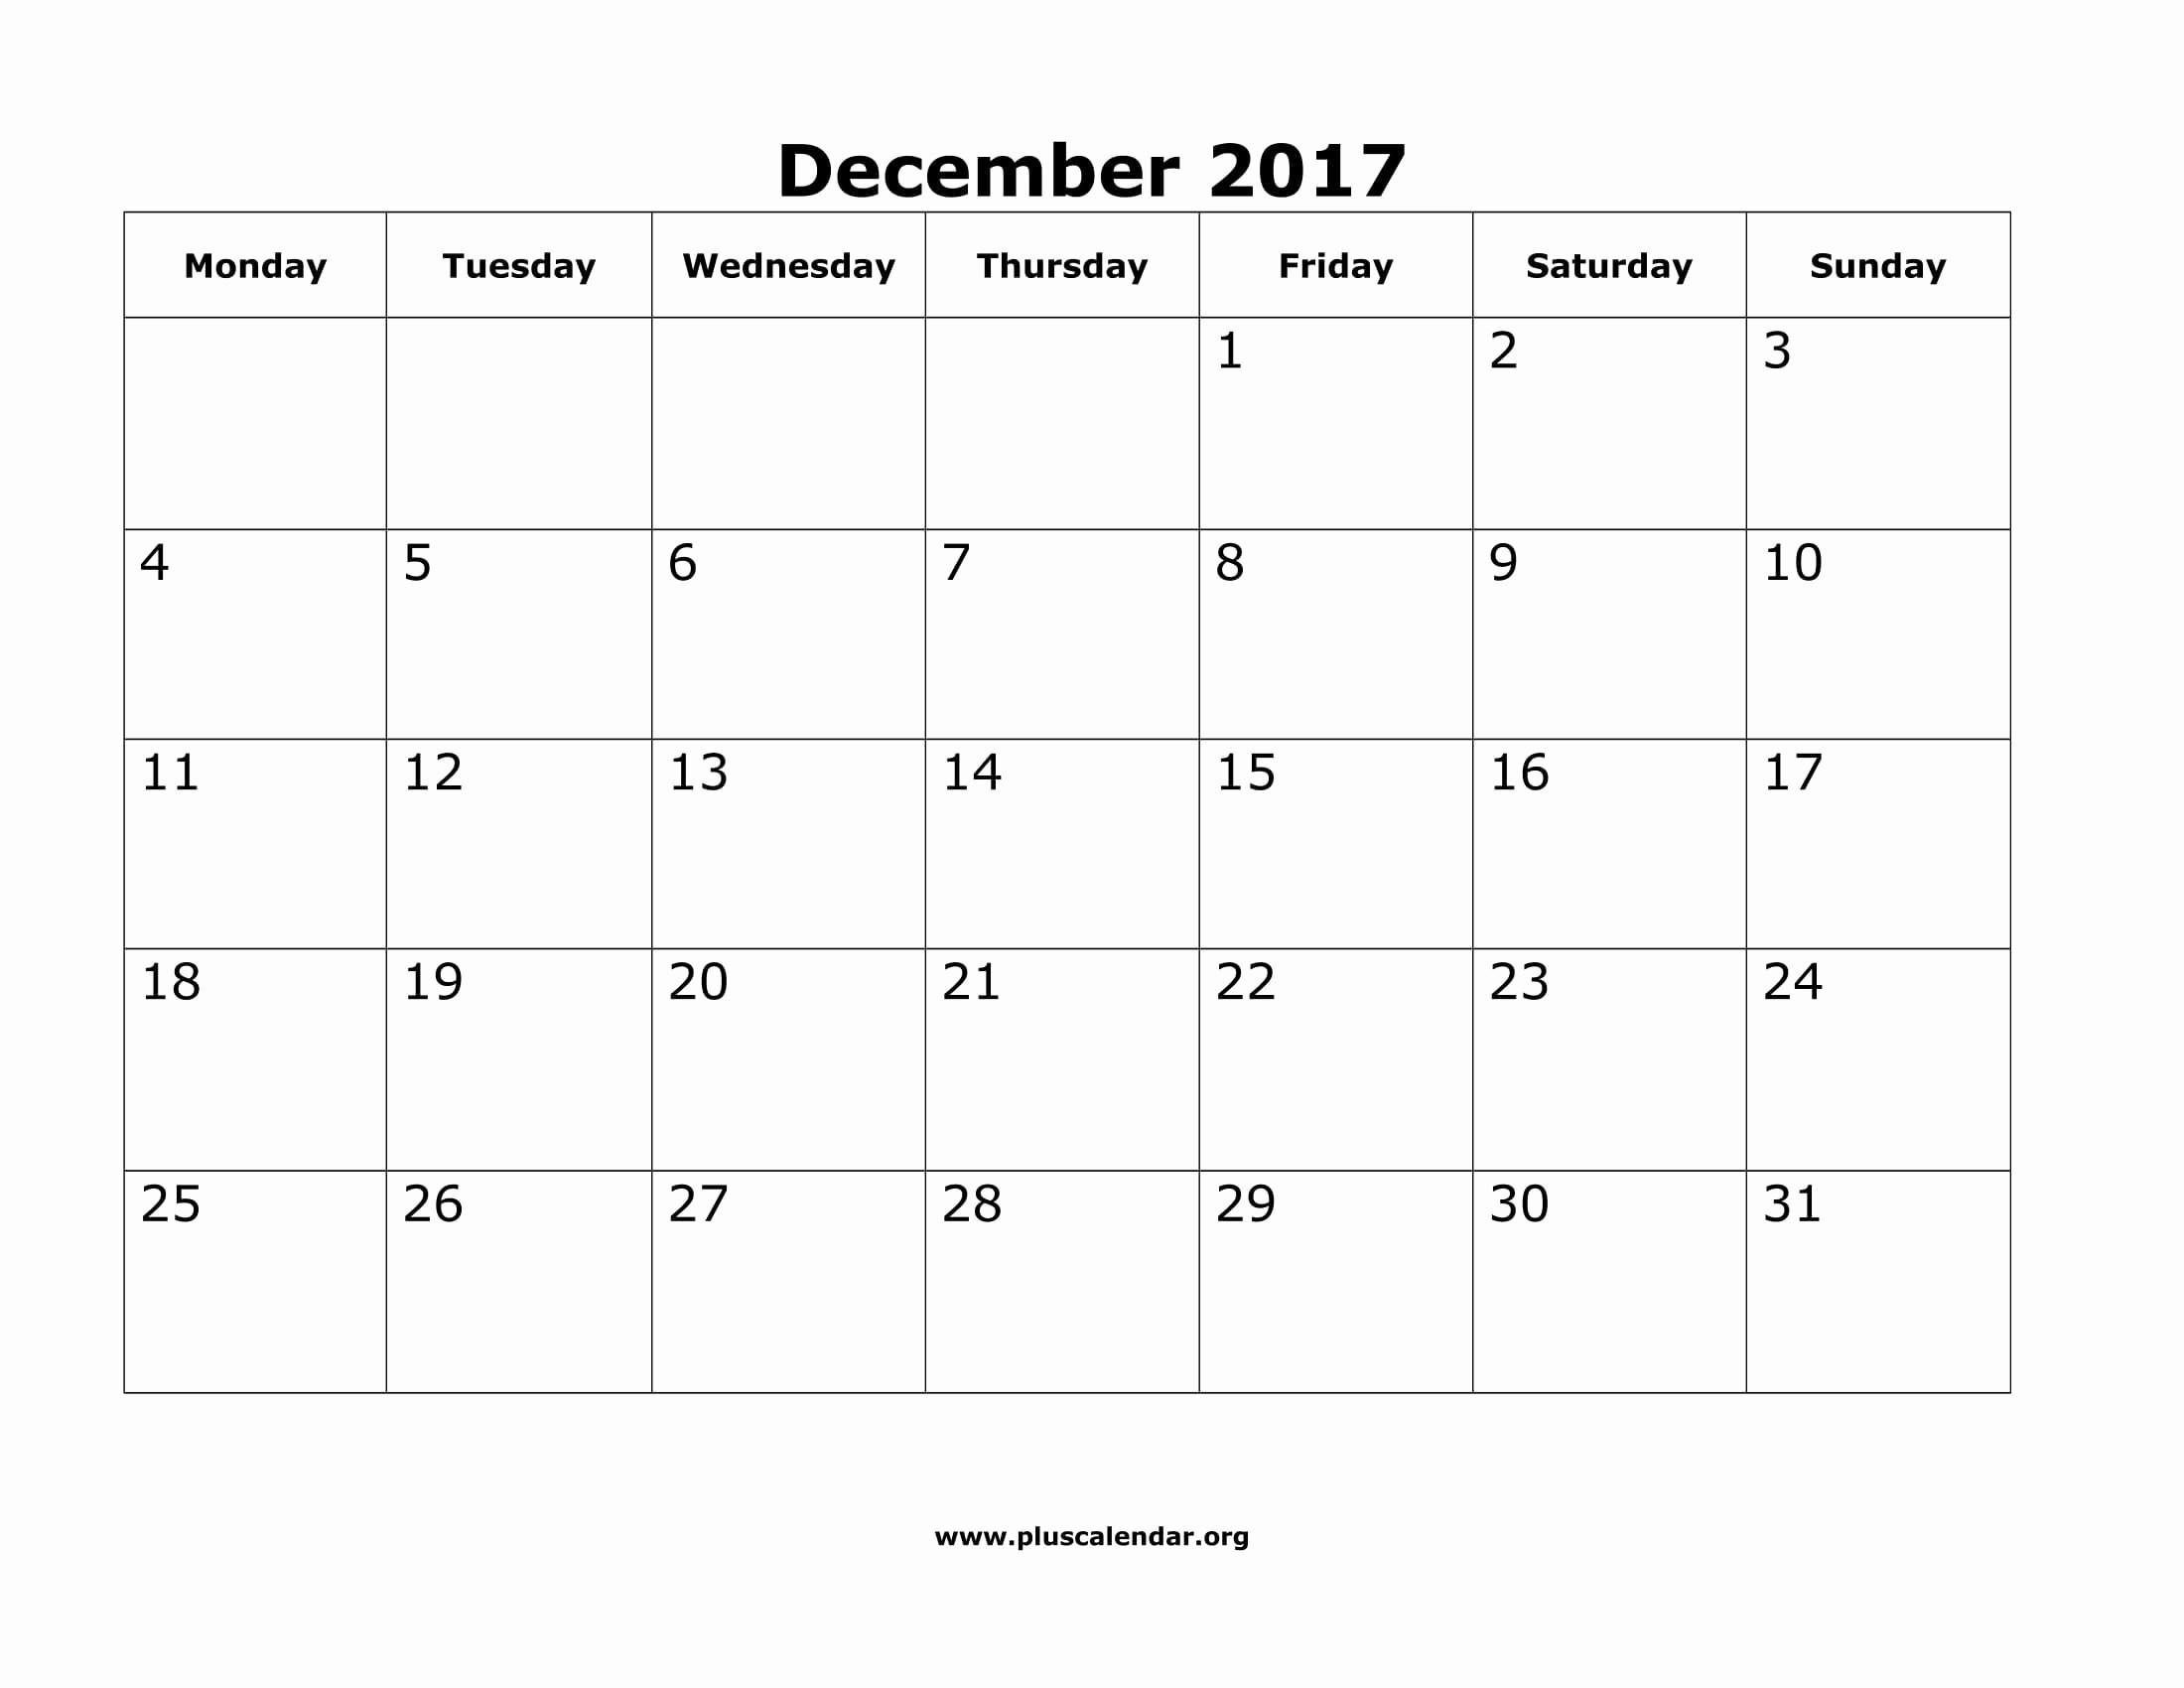 Calendar 2017 Monday to Sunday Luxury November 2018 Monday Through Sunday – Template Calendar Design